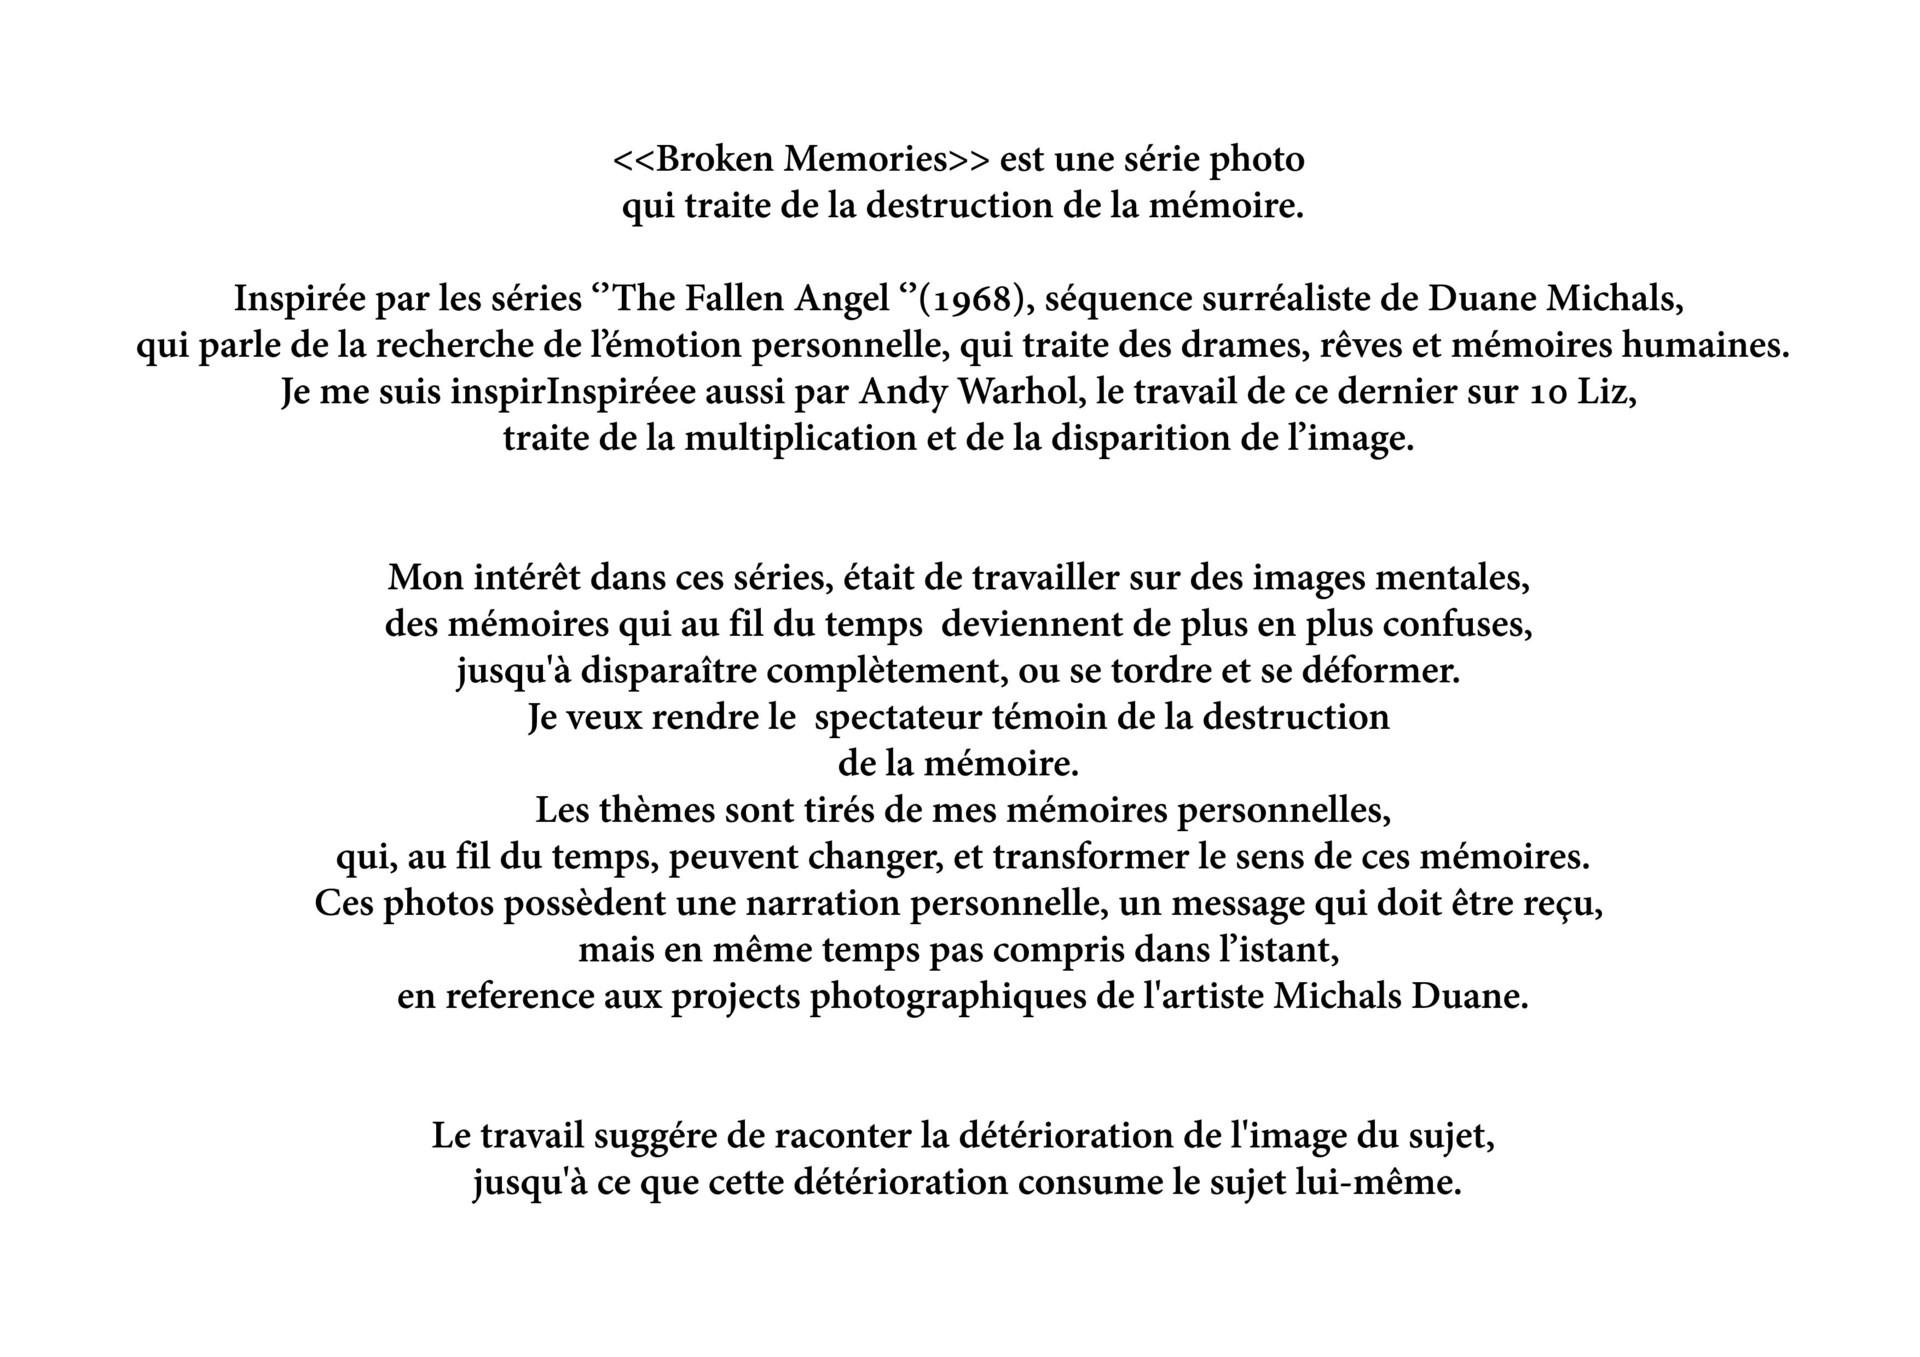 ArtStation - ACCADEMIC PHOTOS PROJECT - Memoire, Carulli